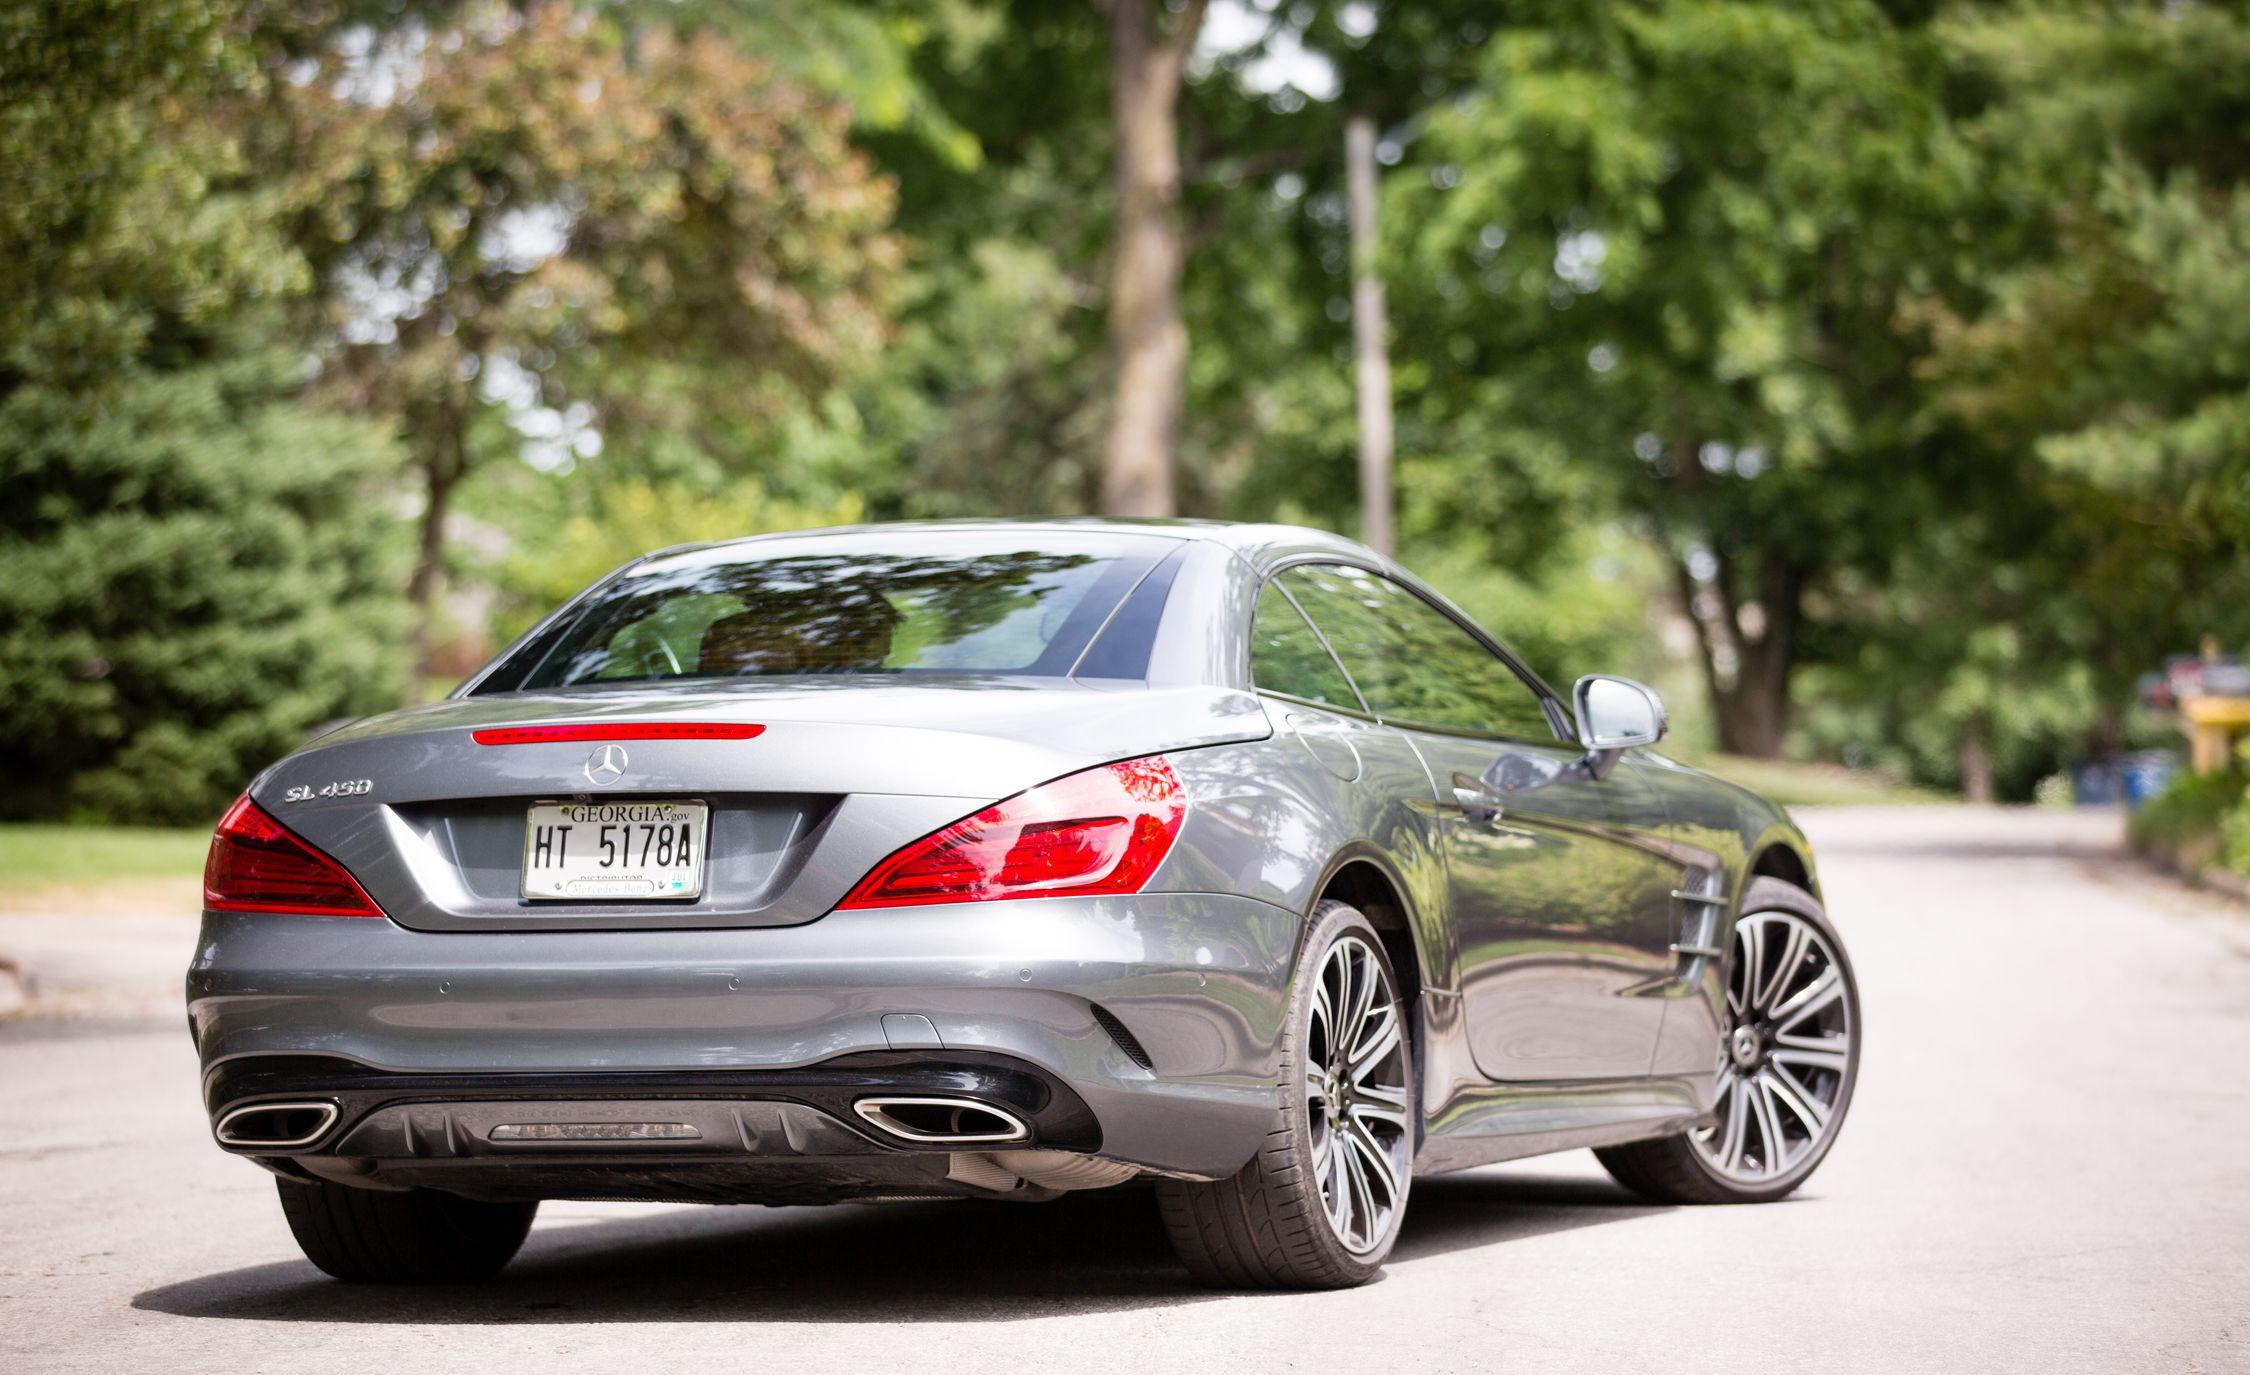 Mercedes Benz Sl Class Reviews Price 3 5l Engine Diagram Photos And Specs Car Driver